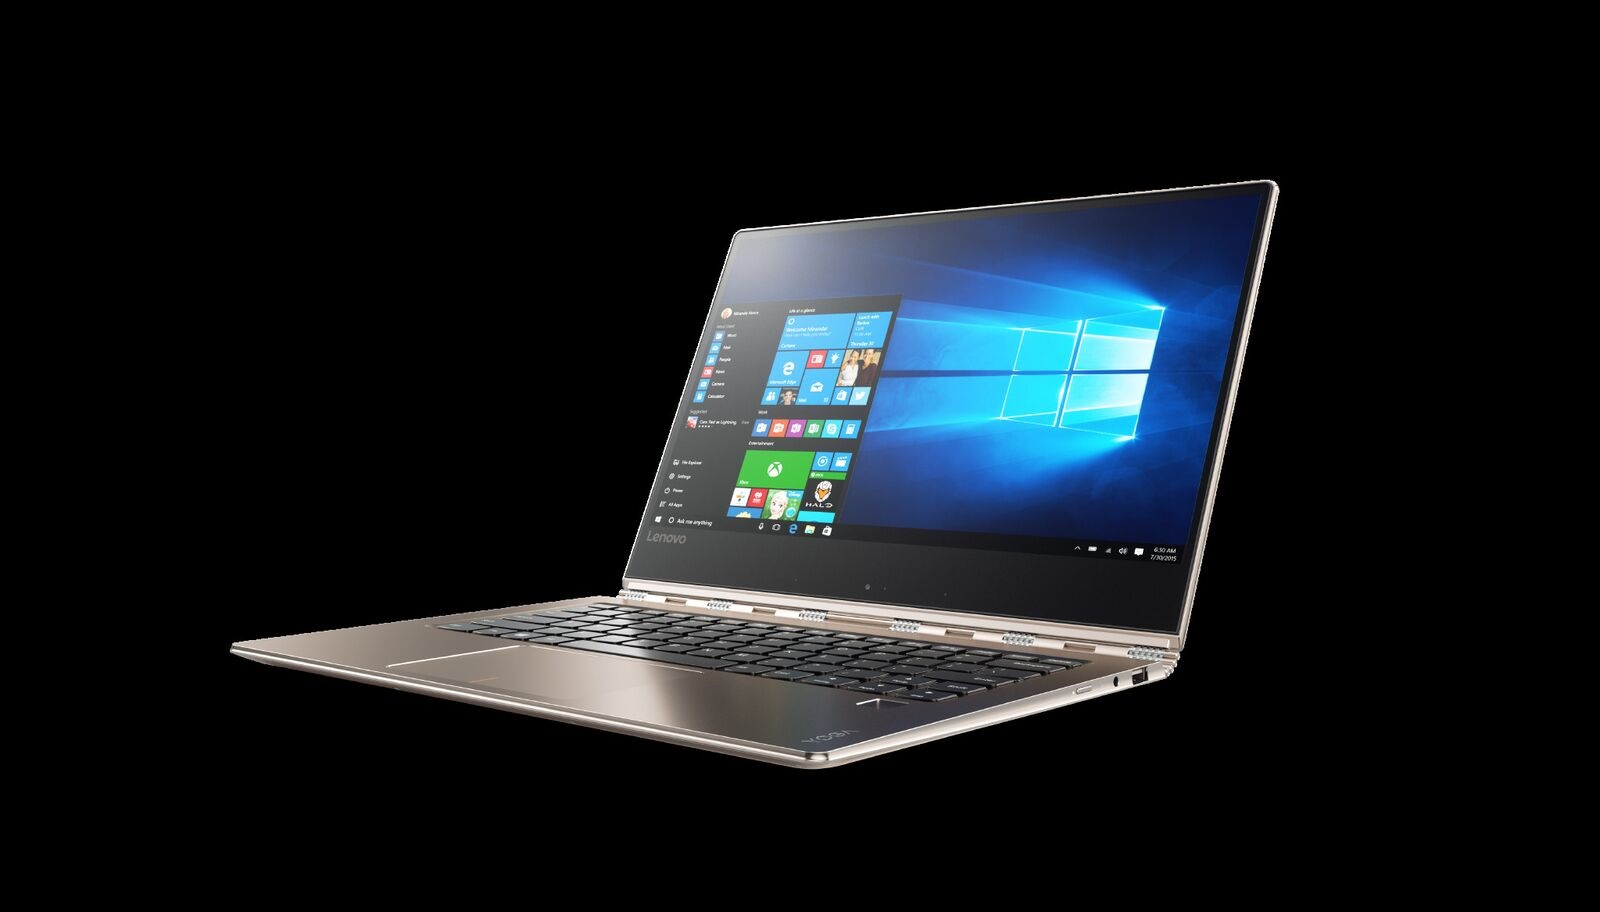 Lenovo IdeaPad YOGA 910-13 IKB 13.9 FHD IPS M Touch/i7-7200U/8G/256SSD/INT/W10H/Backlit/720p/Zlatá